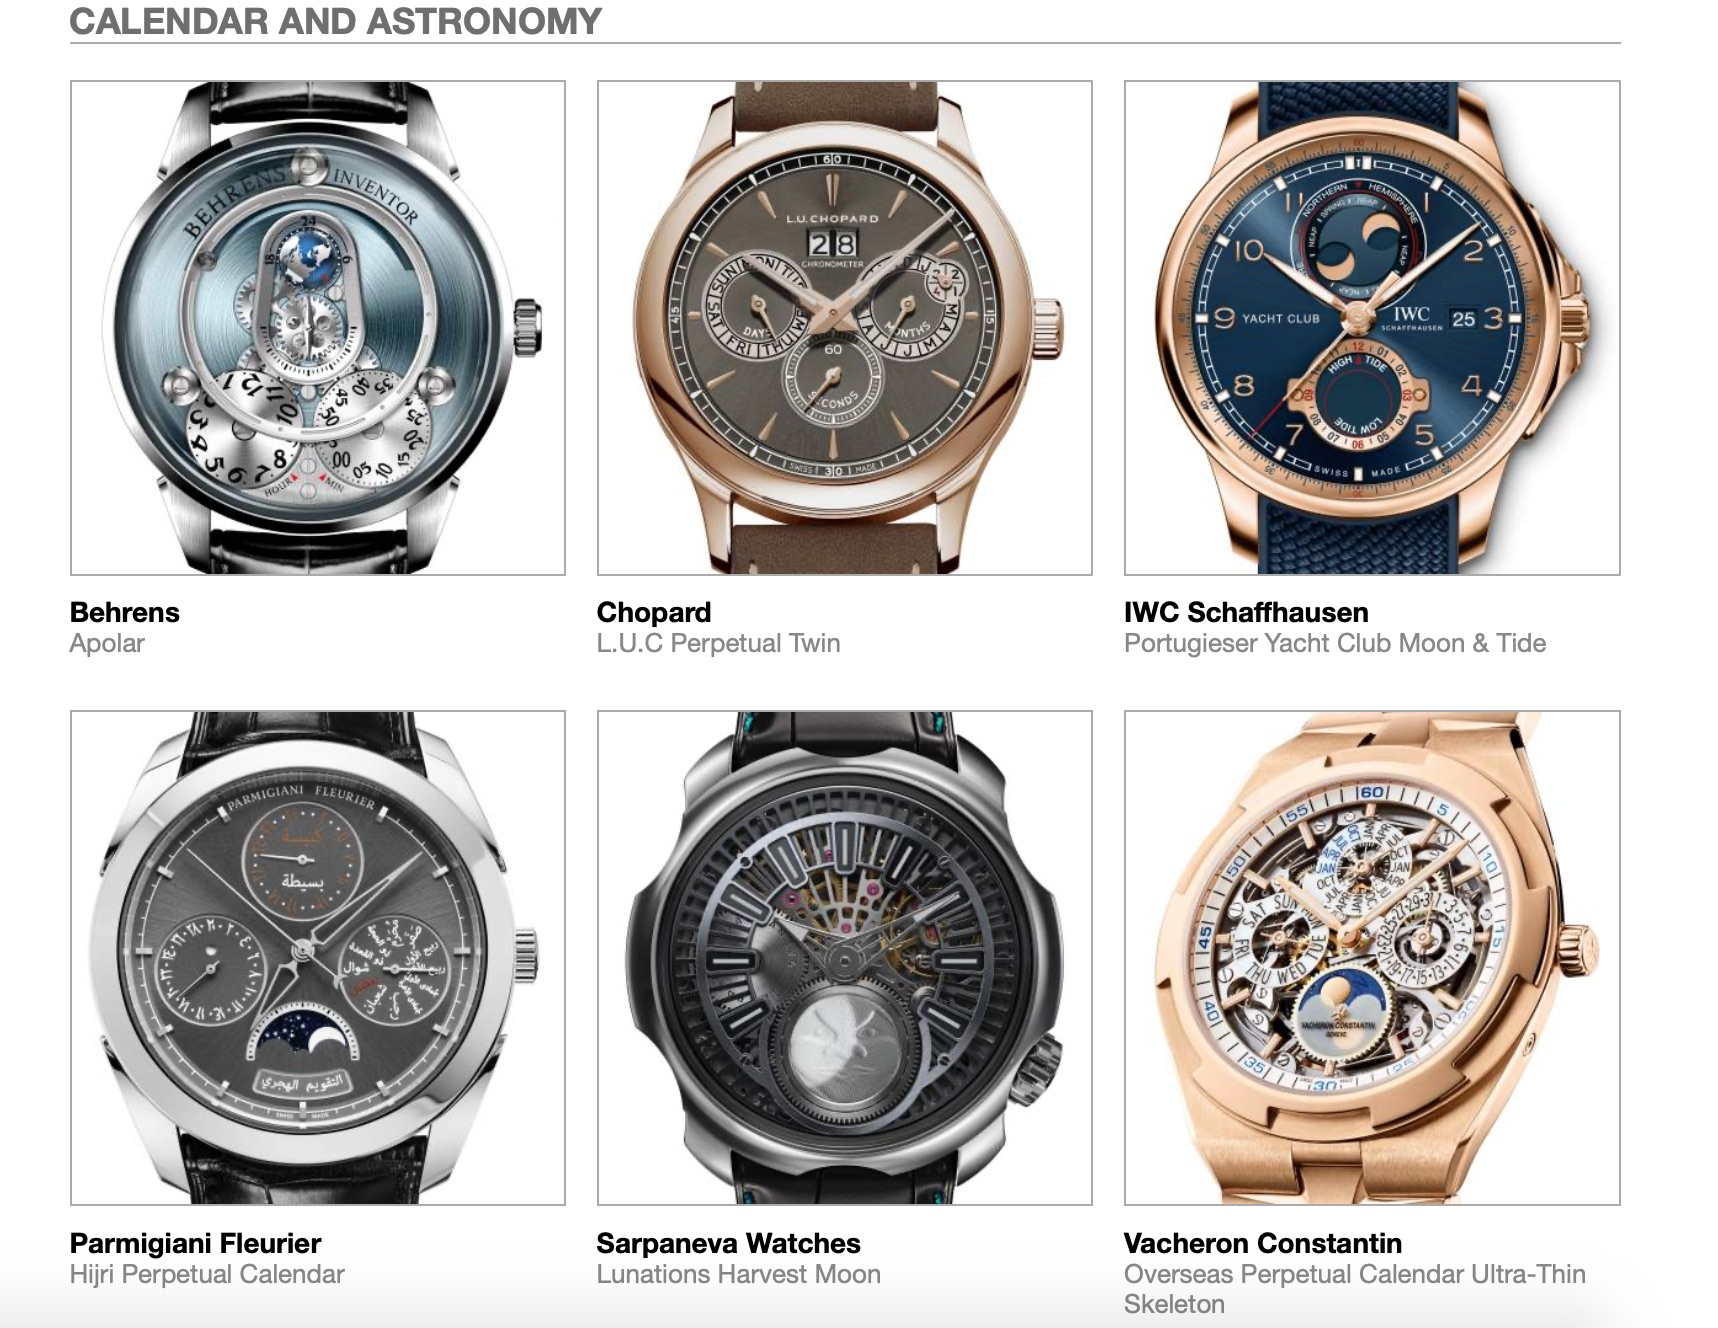 Grand Prix d'Horlogerie de Genève GPHG Academy Nominated Watches 2020 Calendar Astronomy